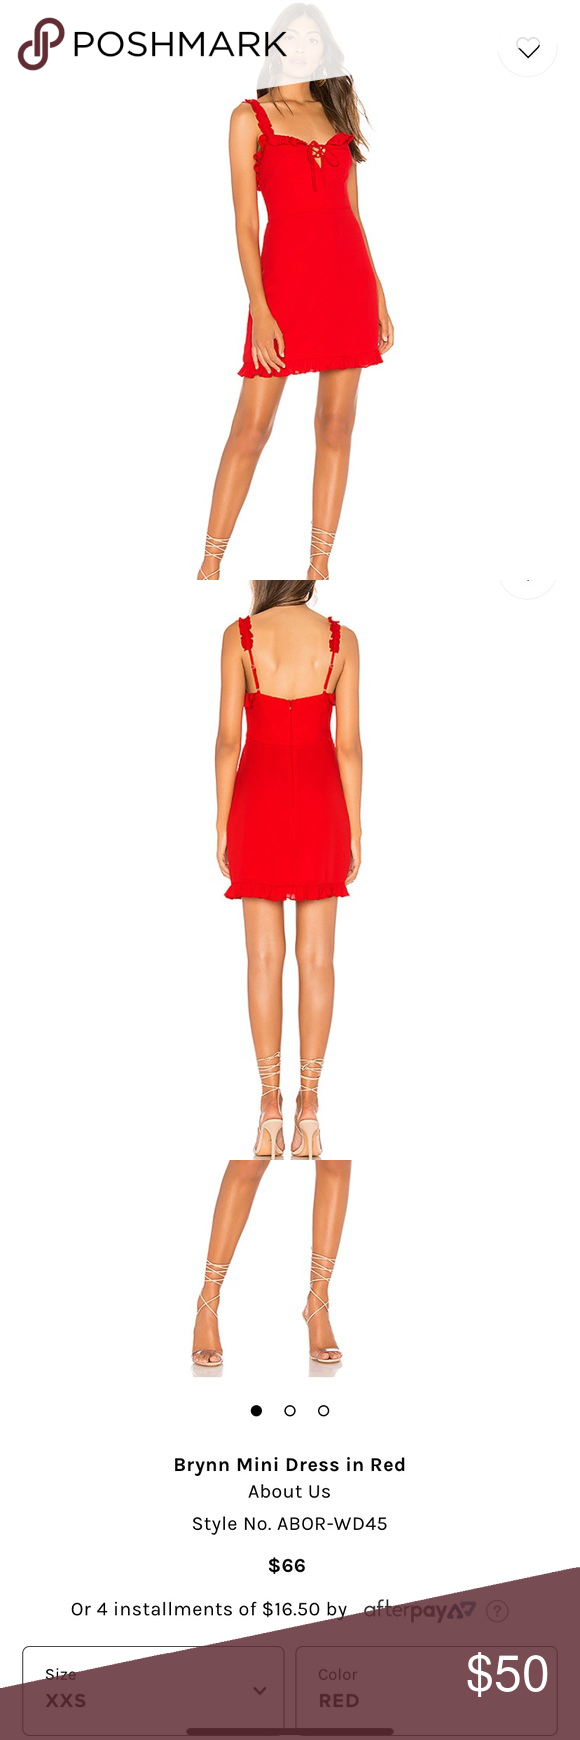 Revolve Nwot Red Mini Dress Red Mini Dress Clothes Design Nordstrom Dresses [ 1740 x 580 Pixel ]